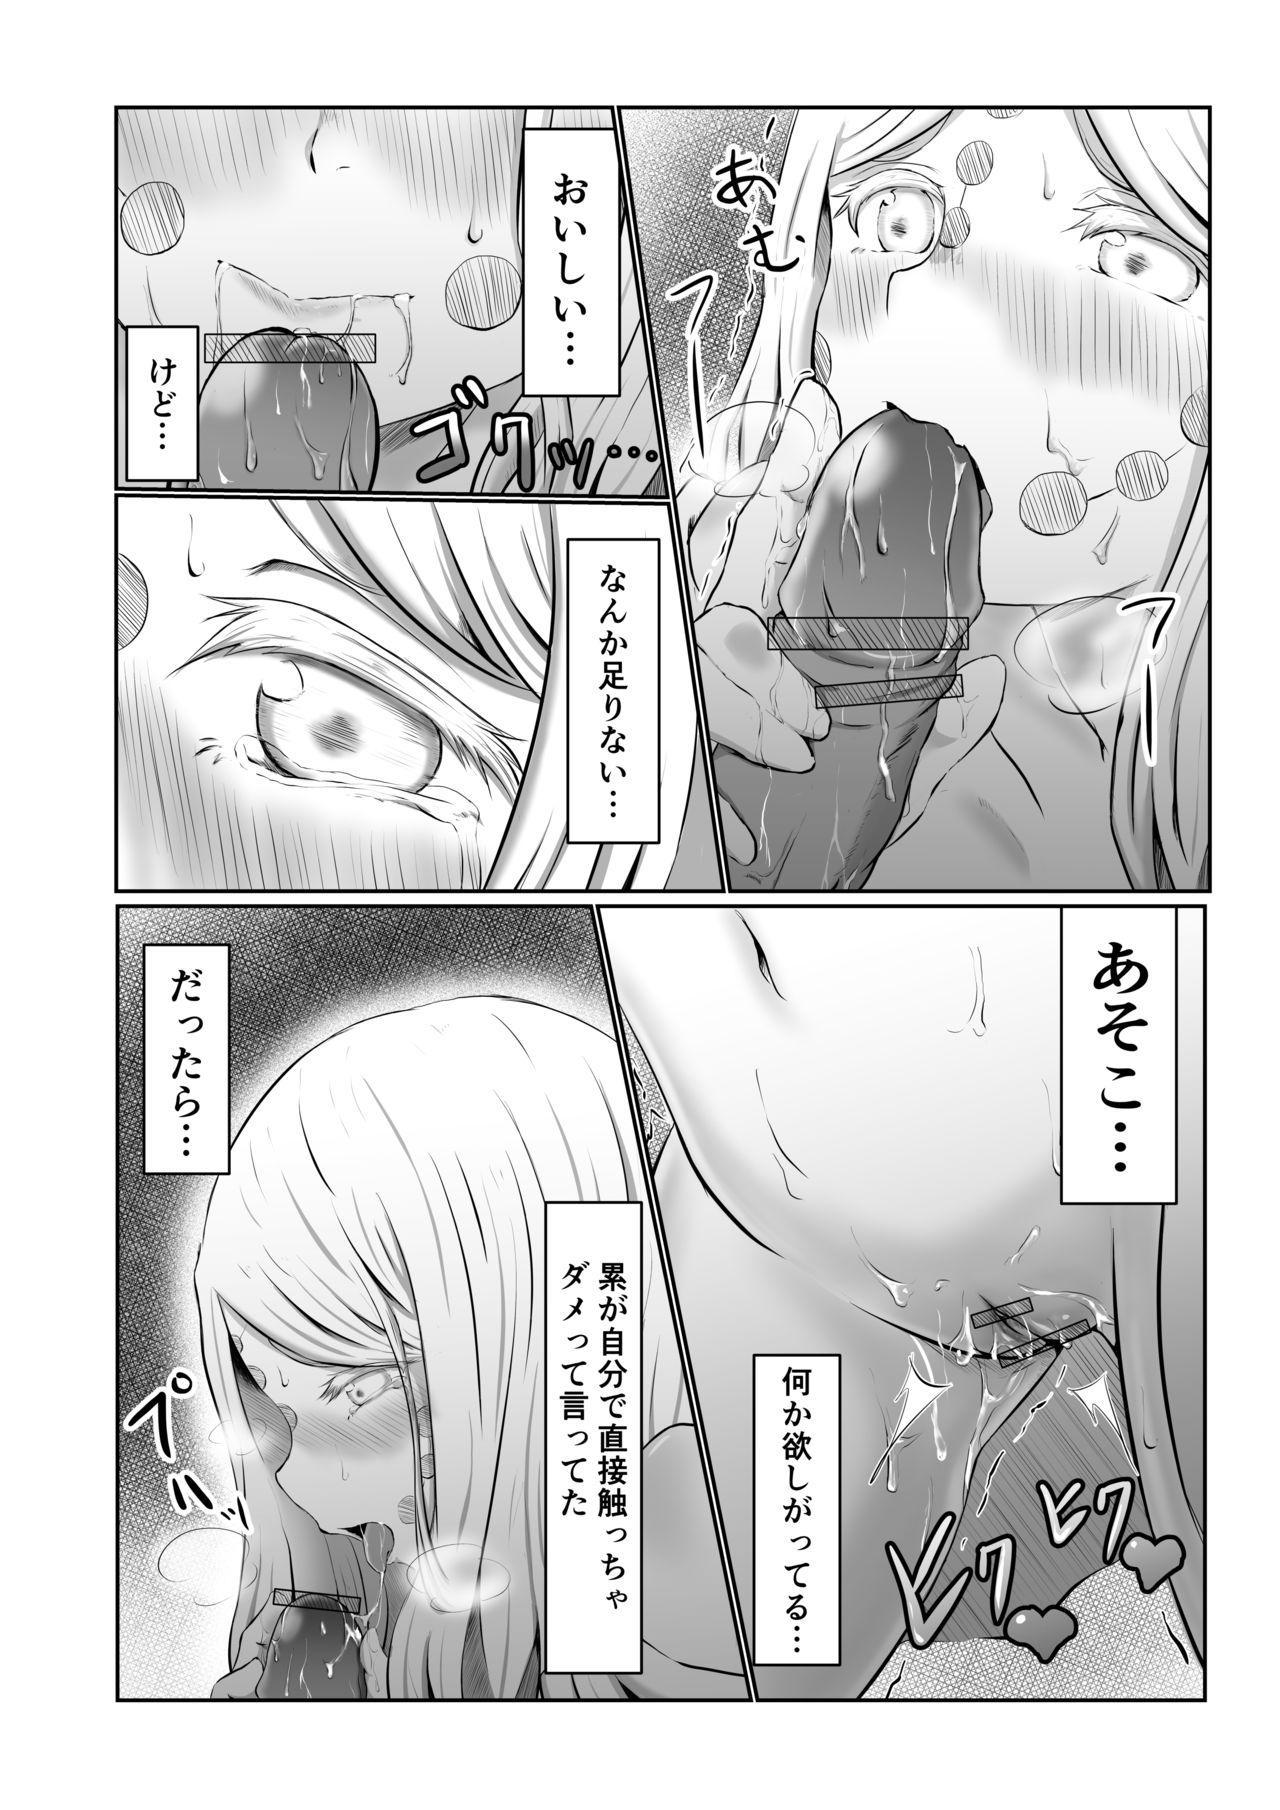 Hinokami Sex. 16